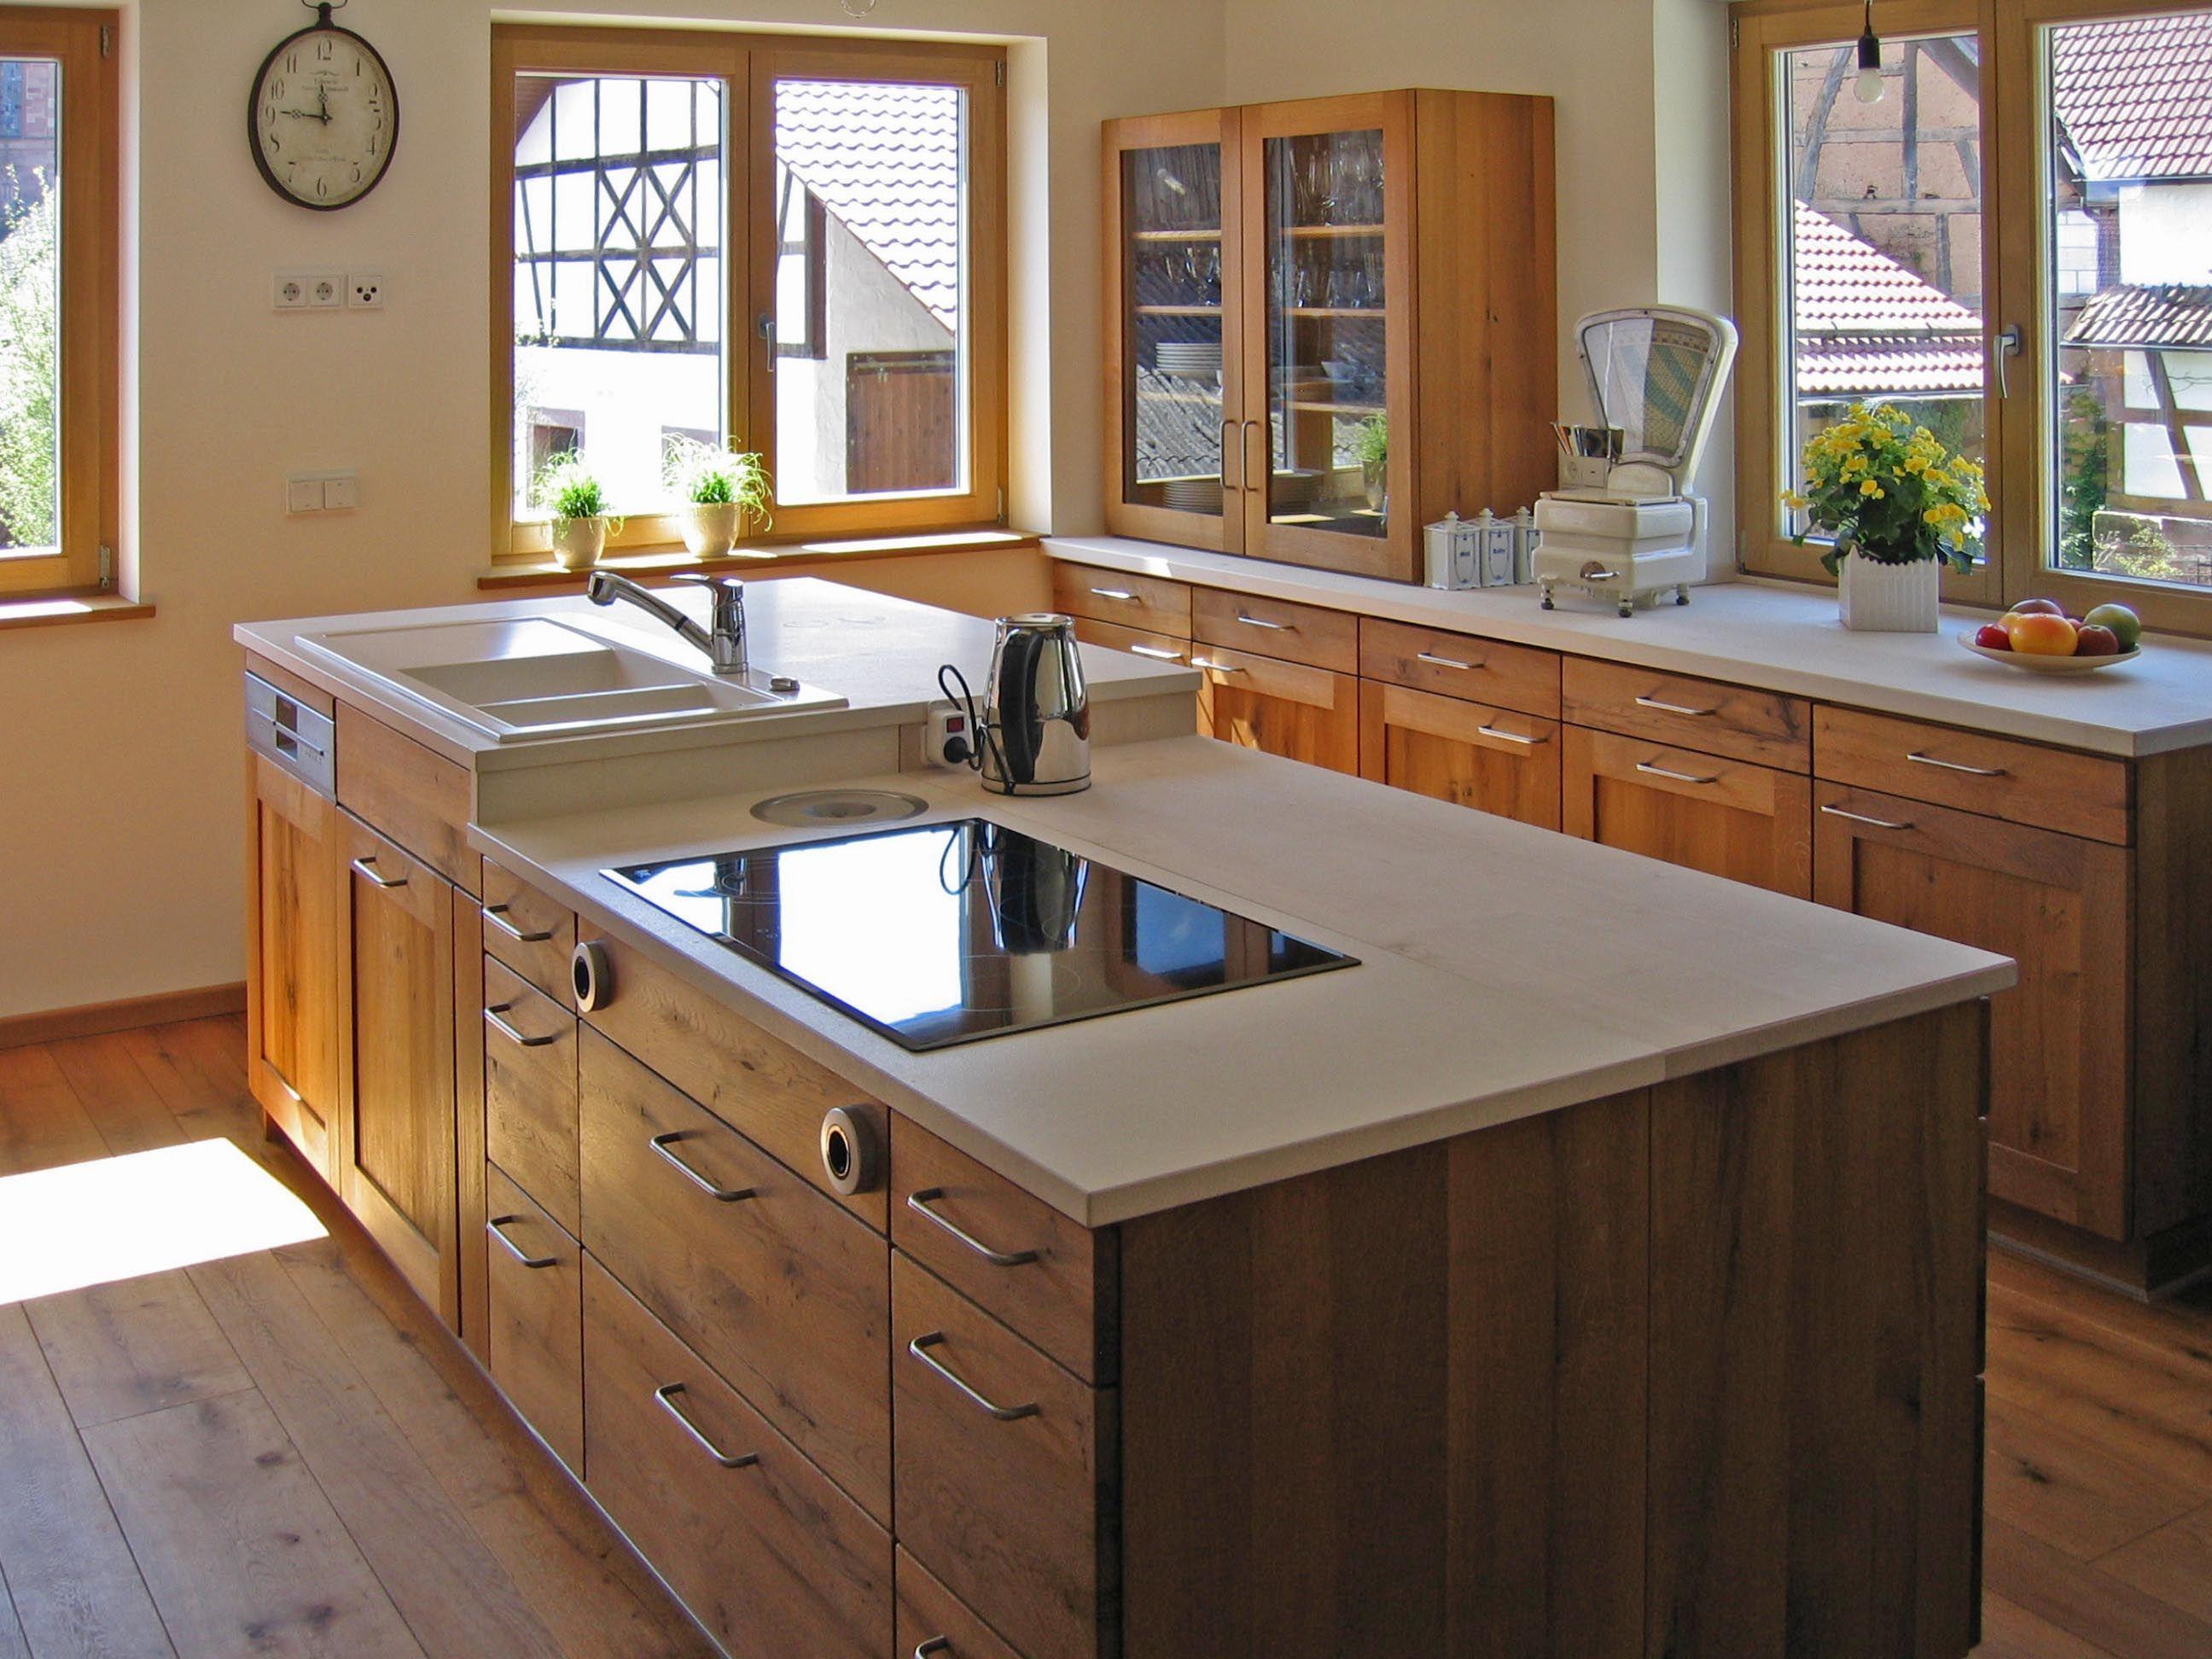 Rustikale Küchenmöbel ~ Naturholz küche wohnen pinterest erlesen naturholz und altholz